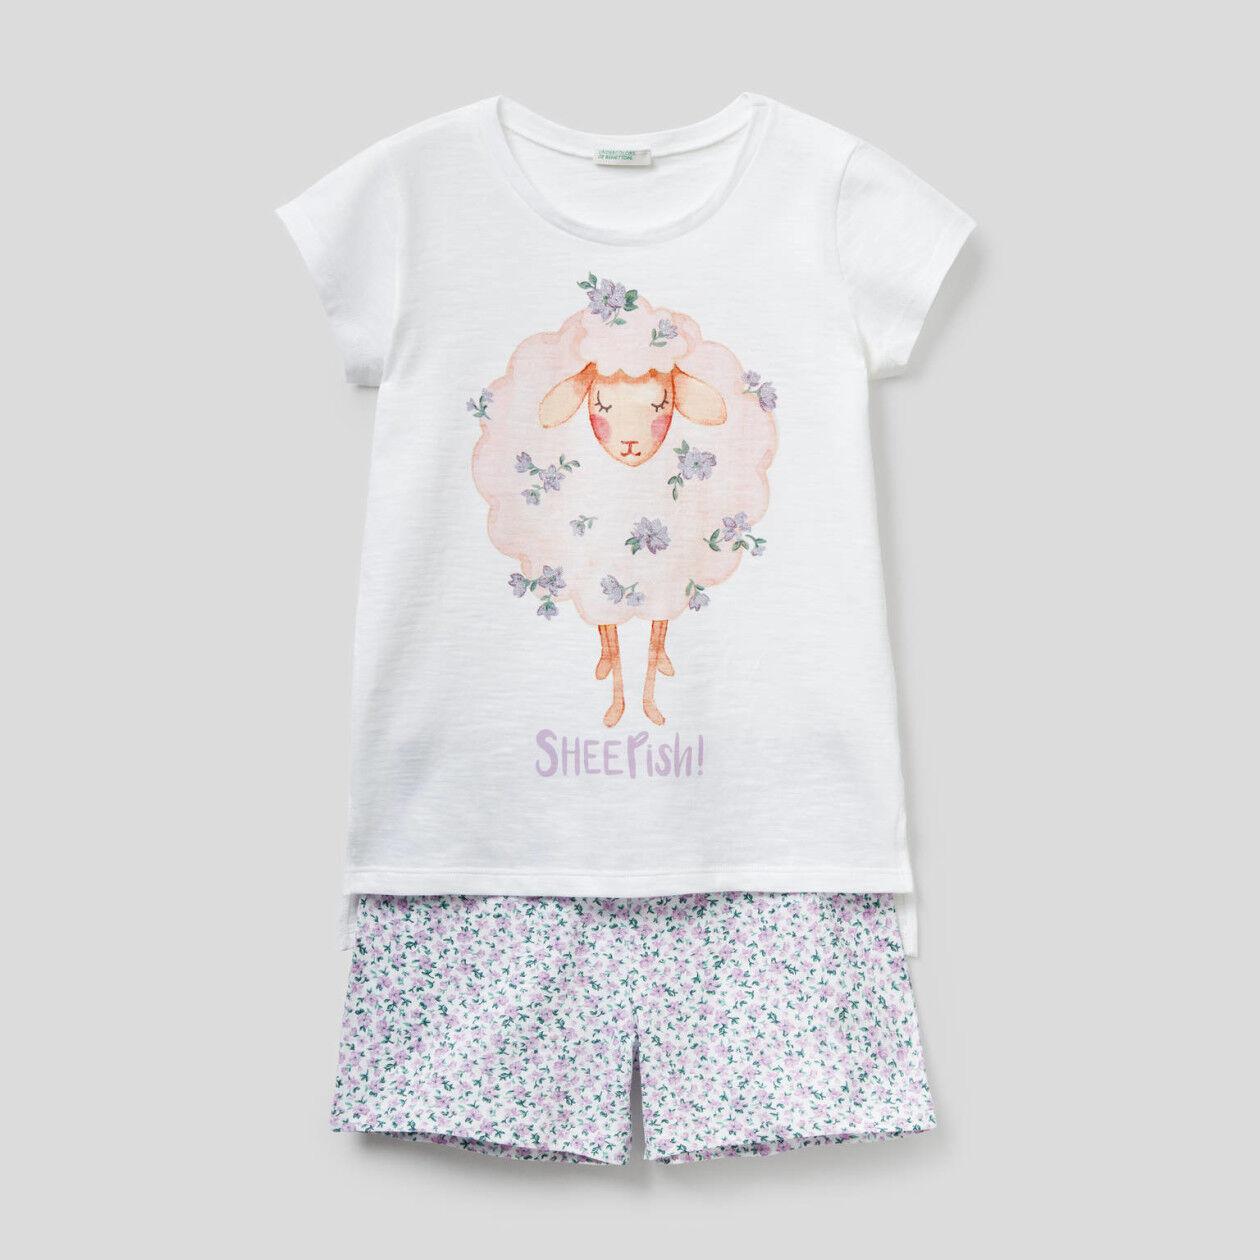 100% cotton short pyjamas